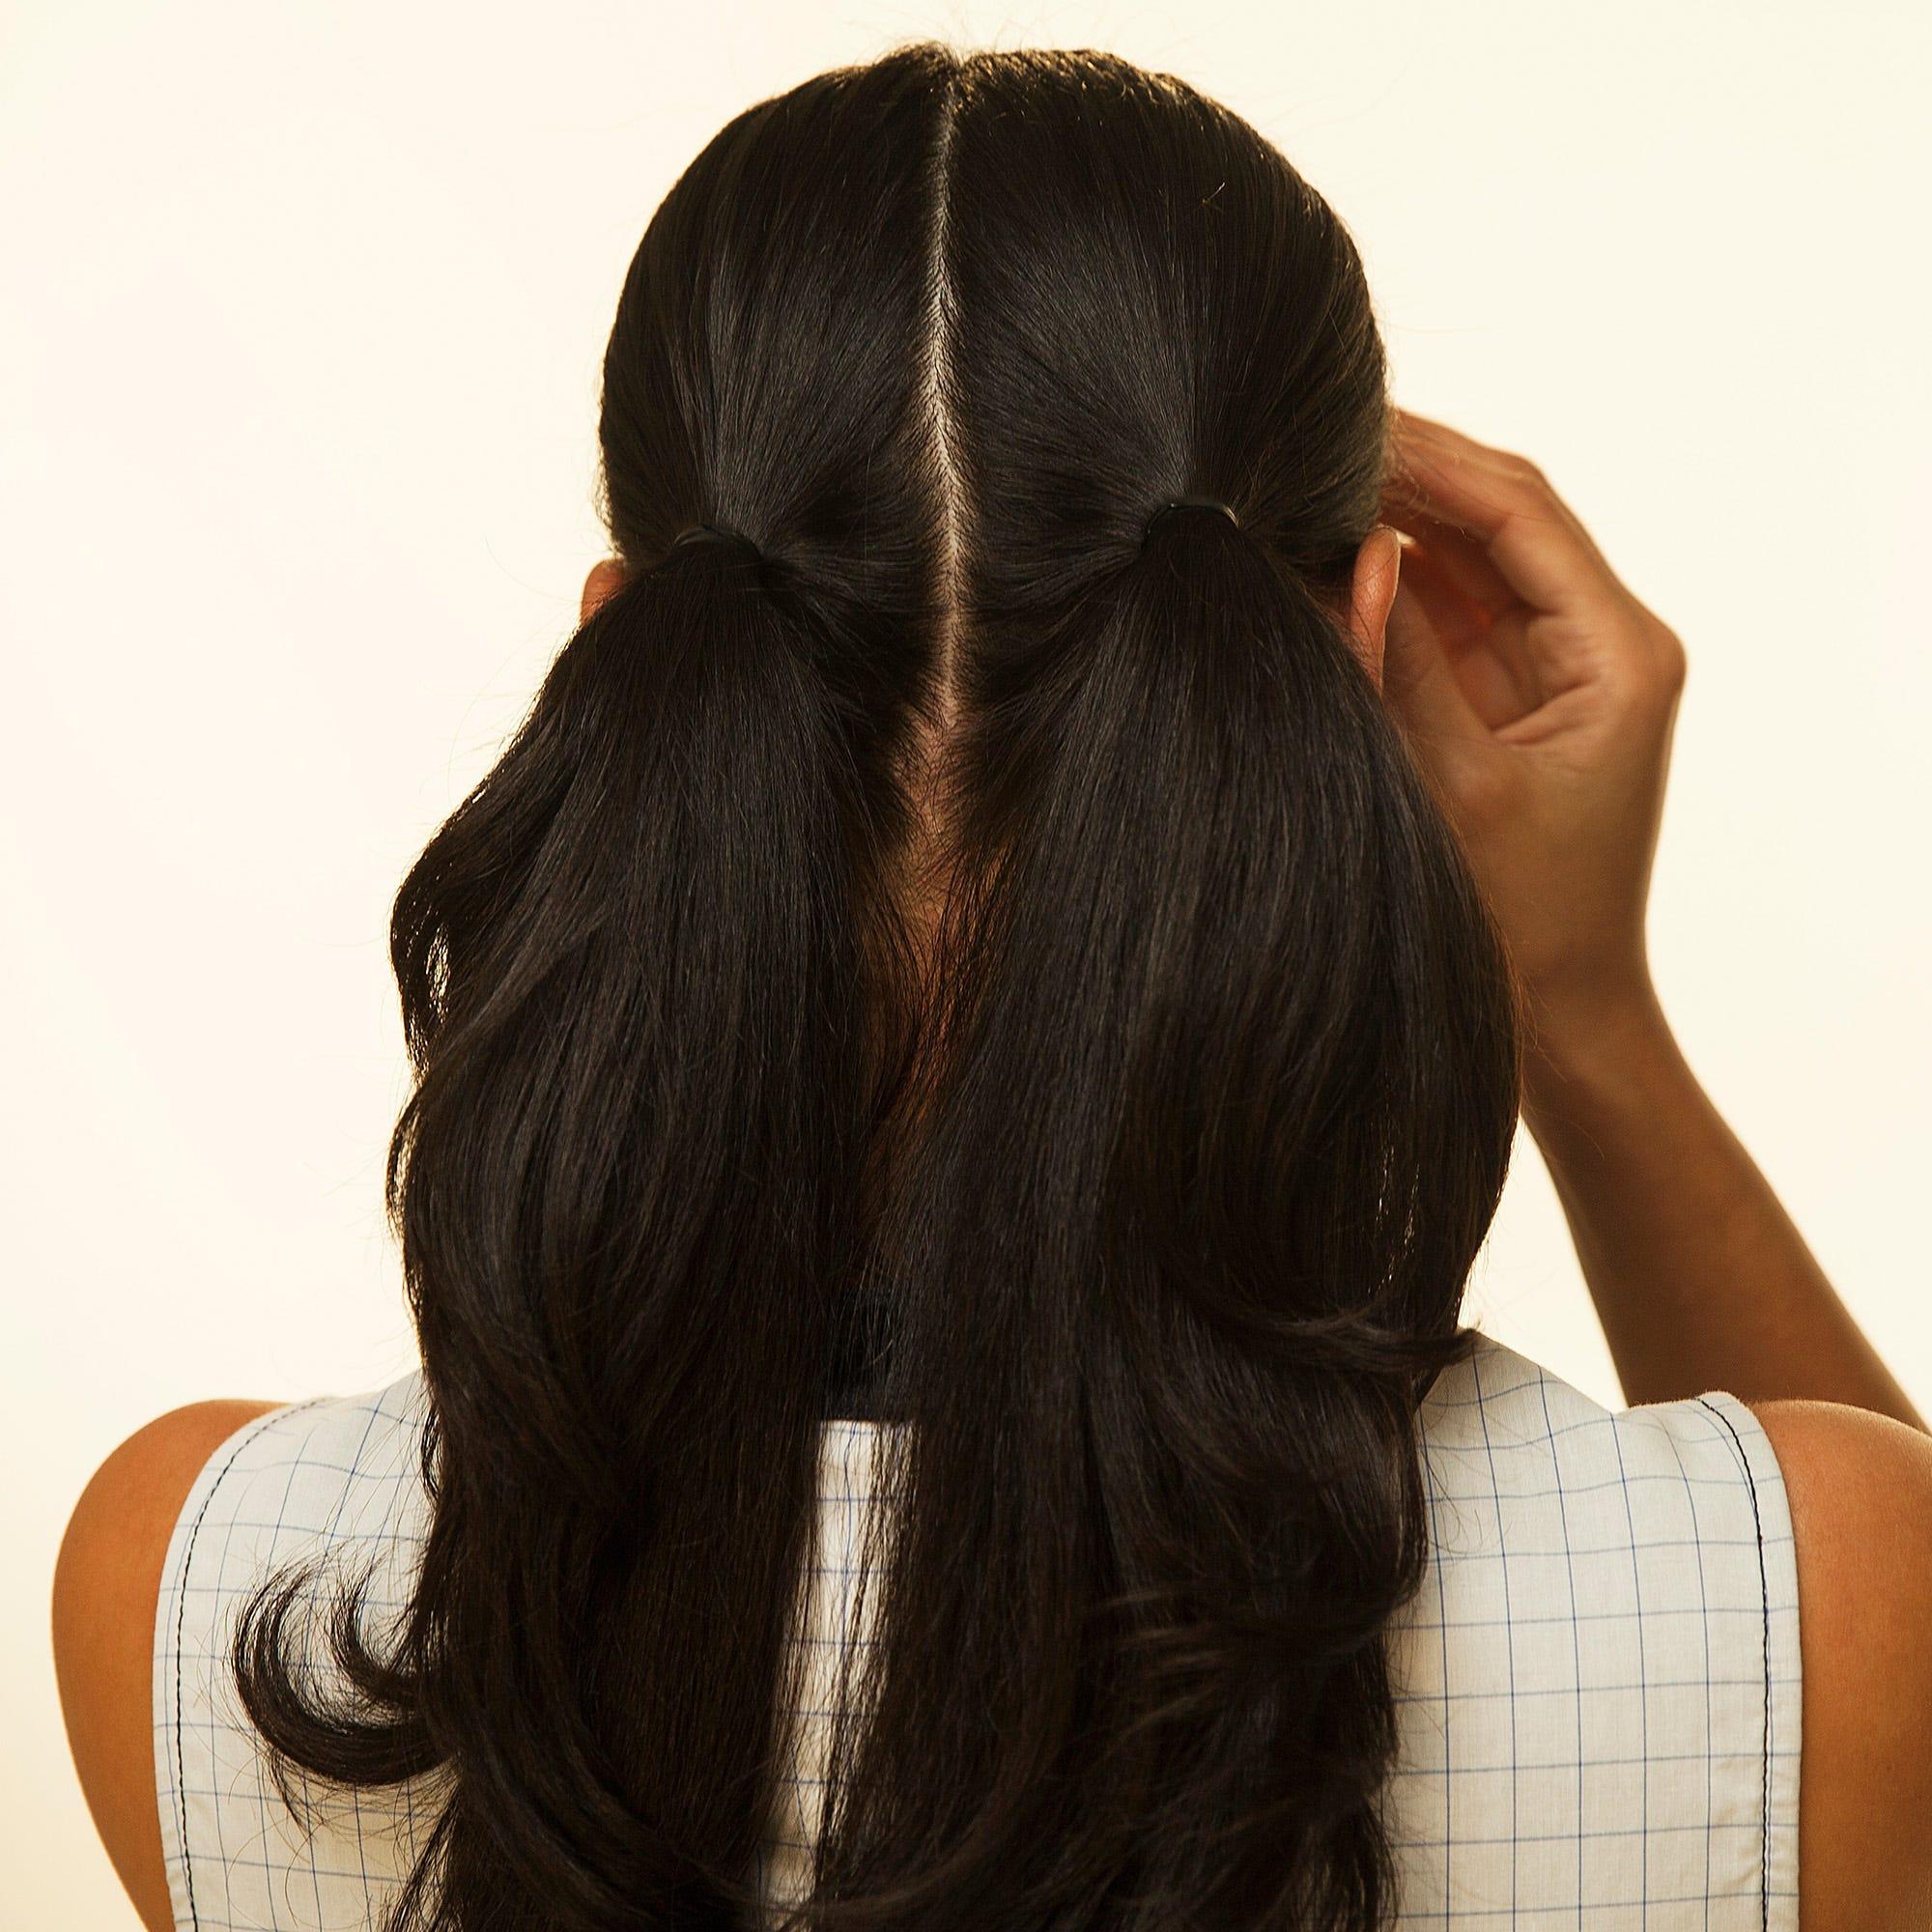 Adult Pigtails Bun Volume Hairstyle Tutorial Video